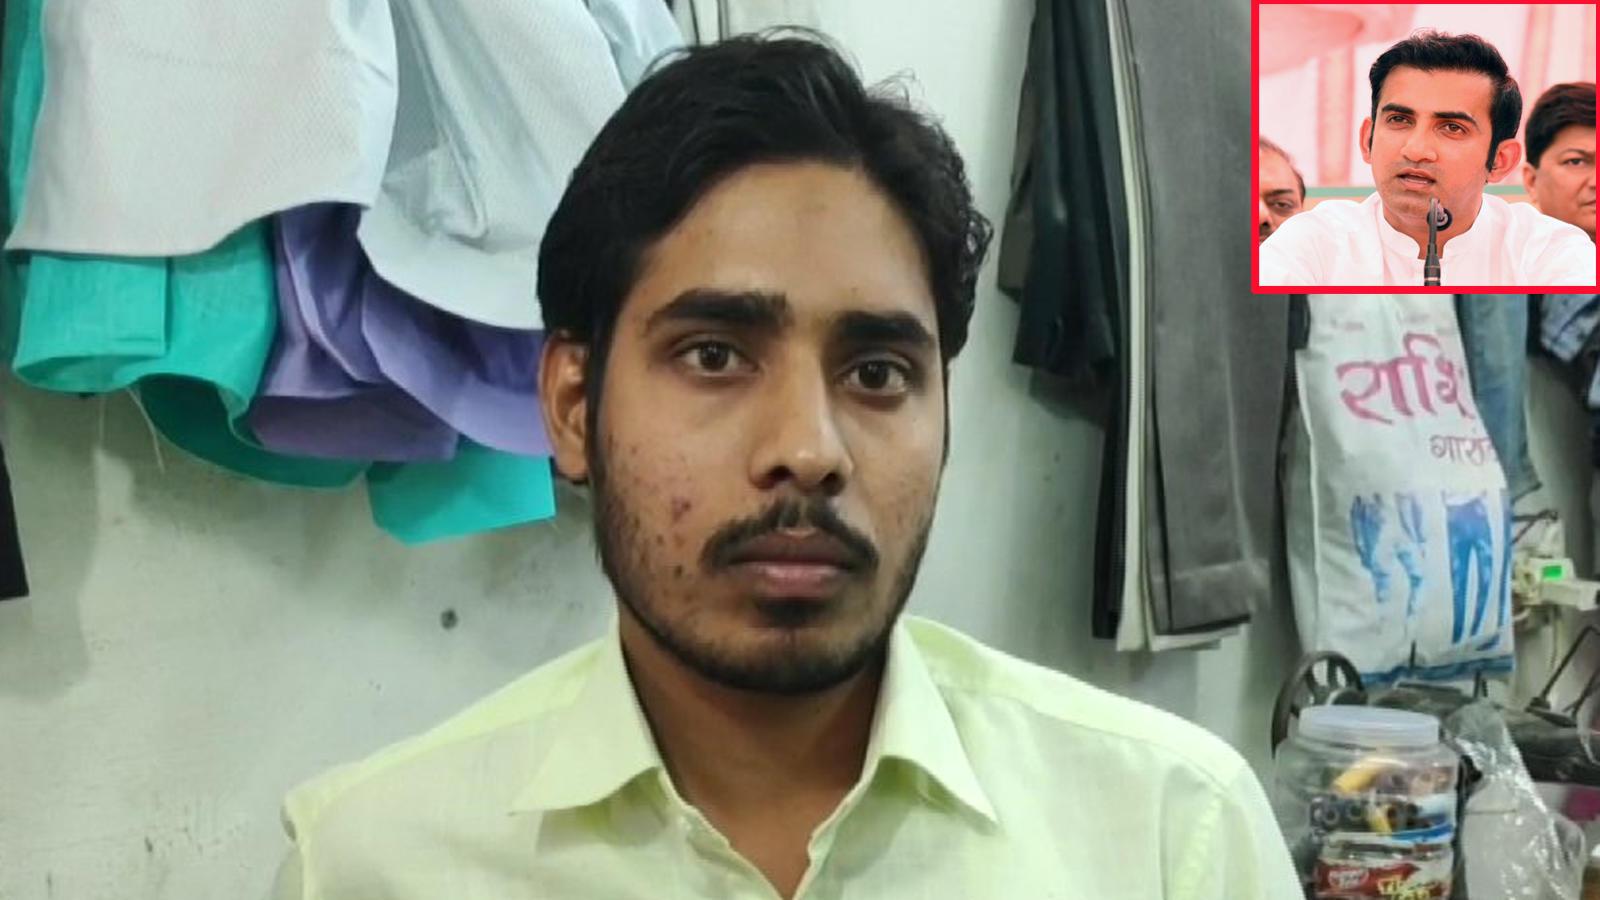 gurugram-muslim-man-assult-case-gautam-gambhir-demands-strict-action-calls-incident-as-deplorable